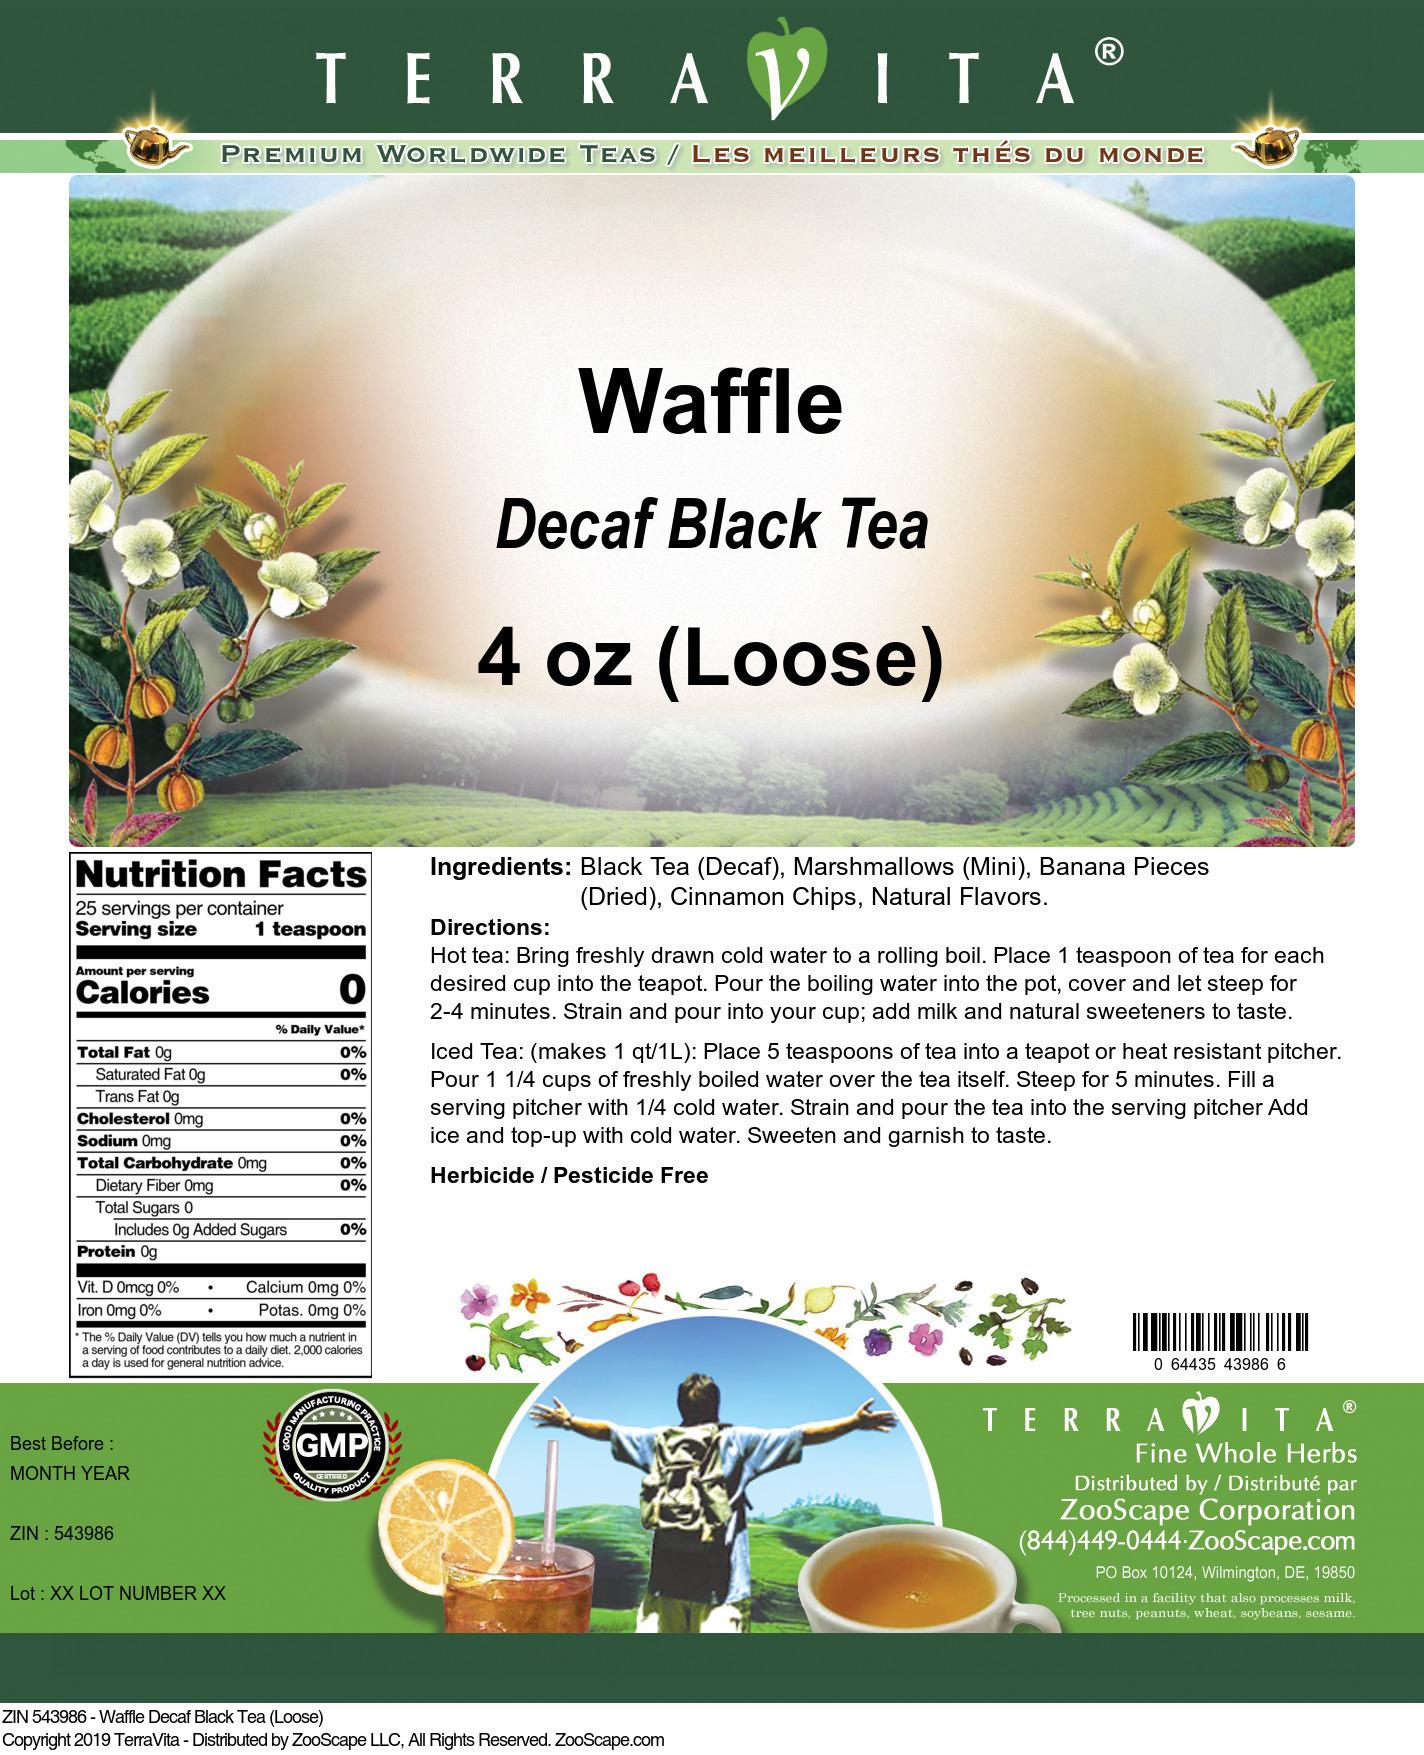 Waffle Decaf Black Tea